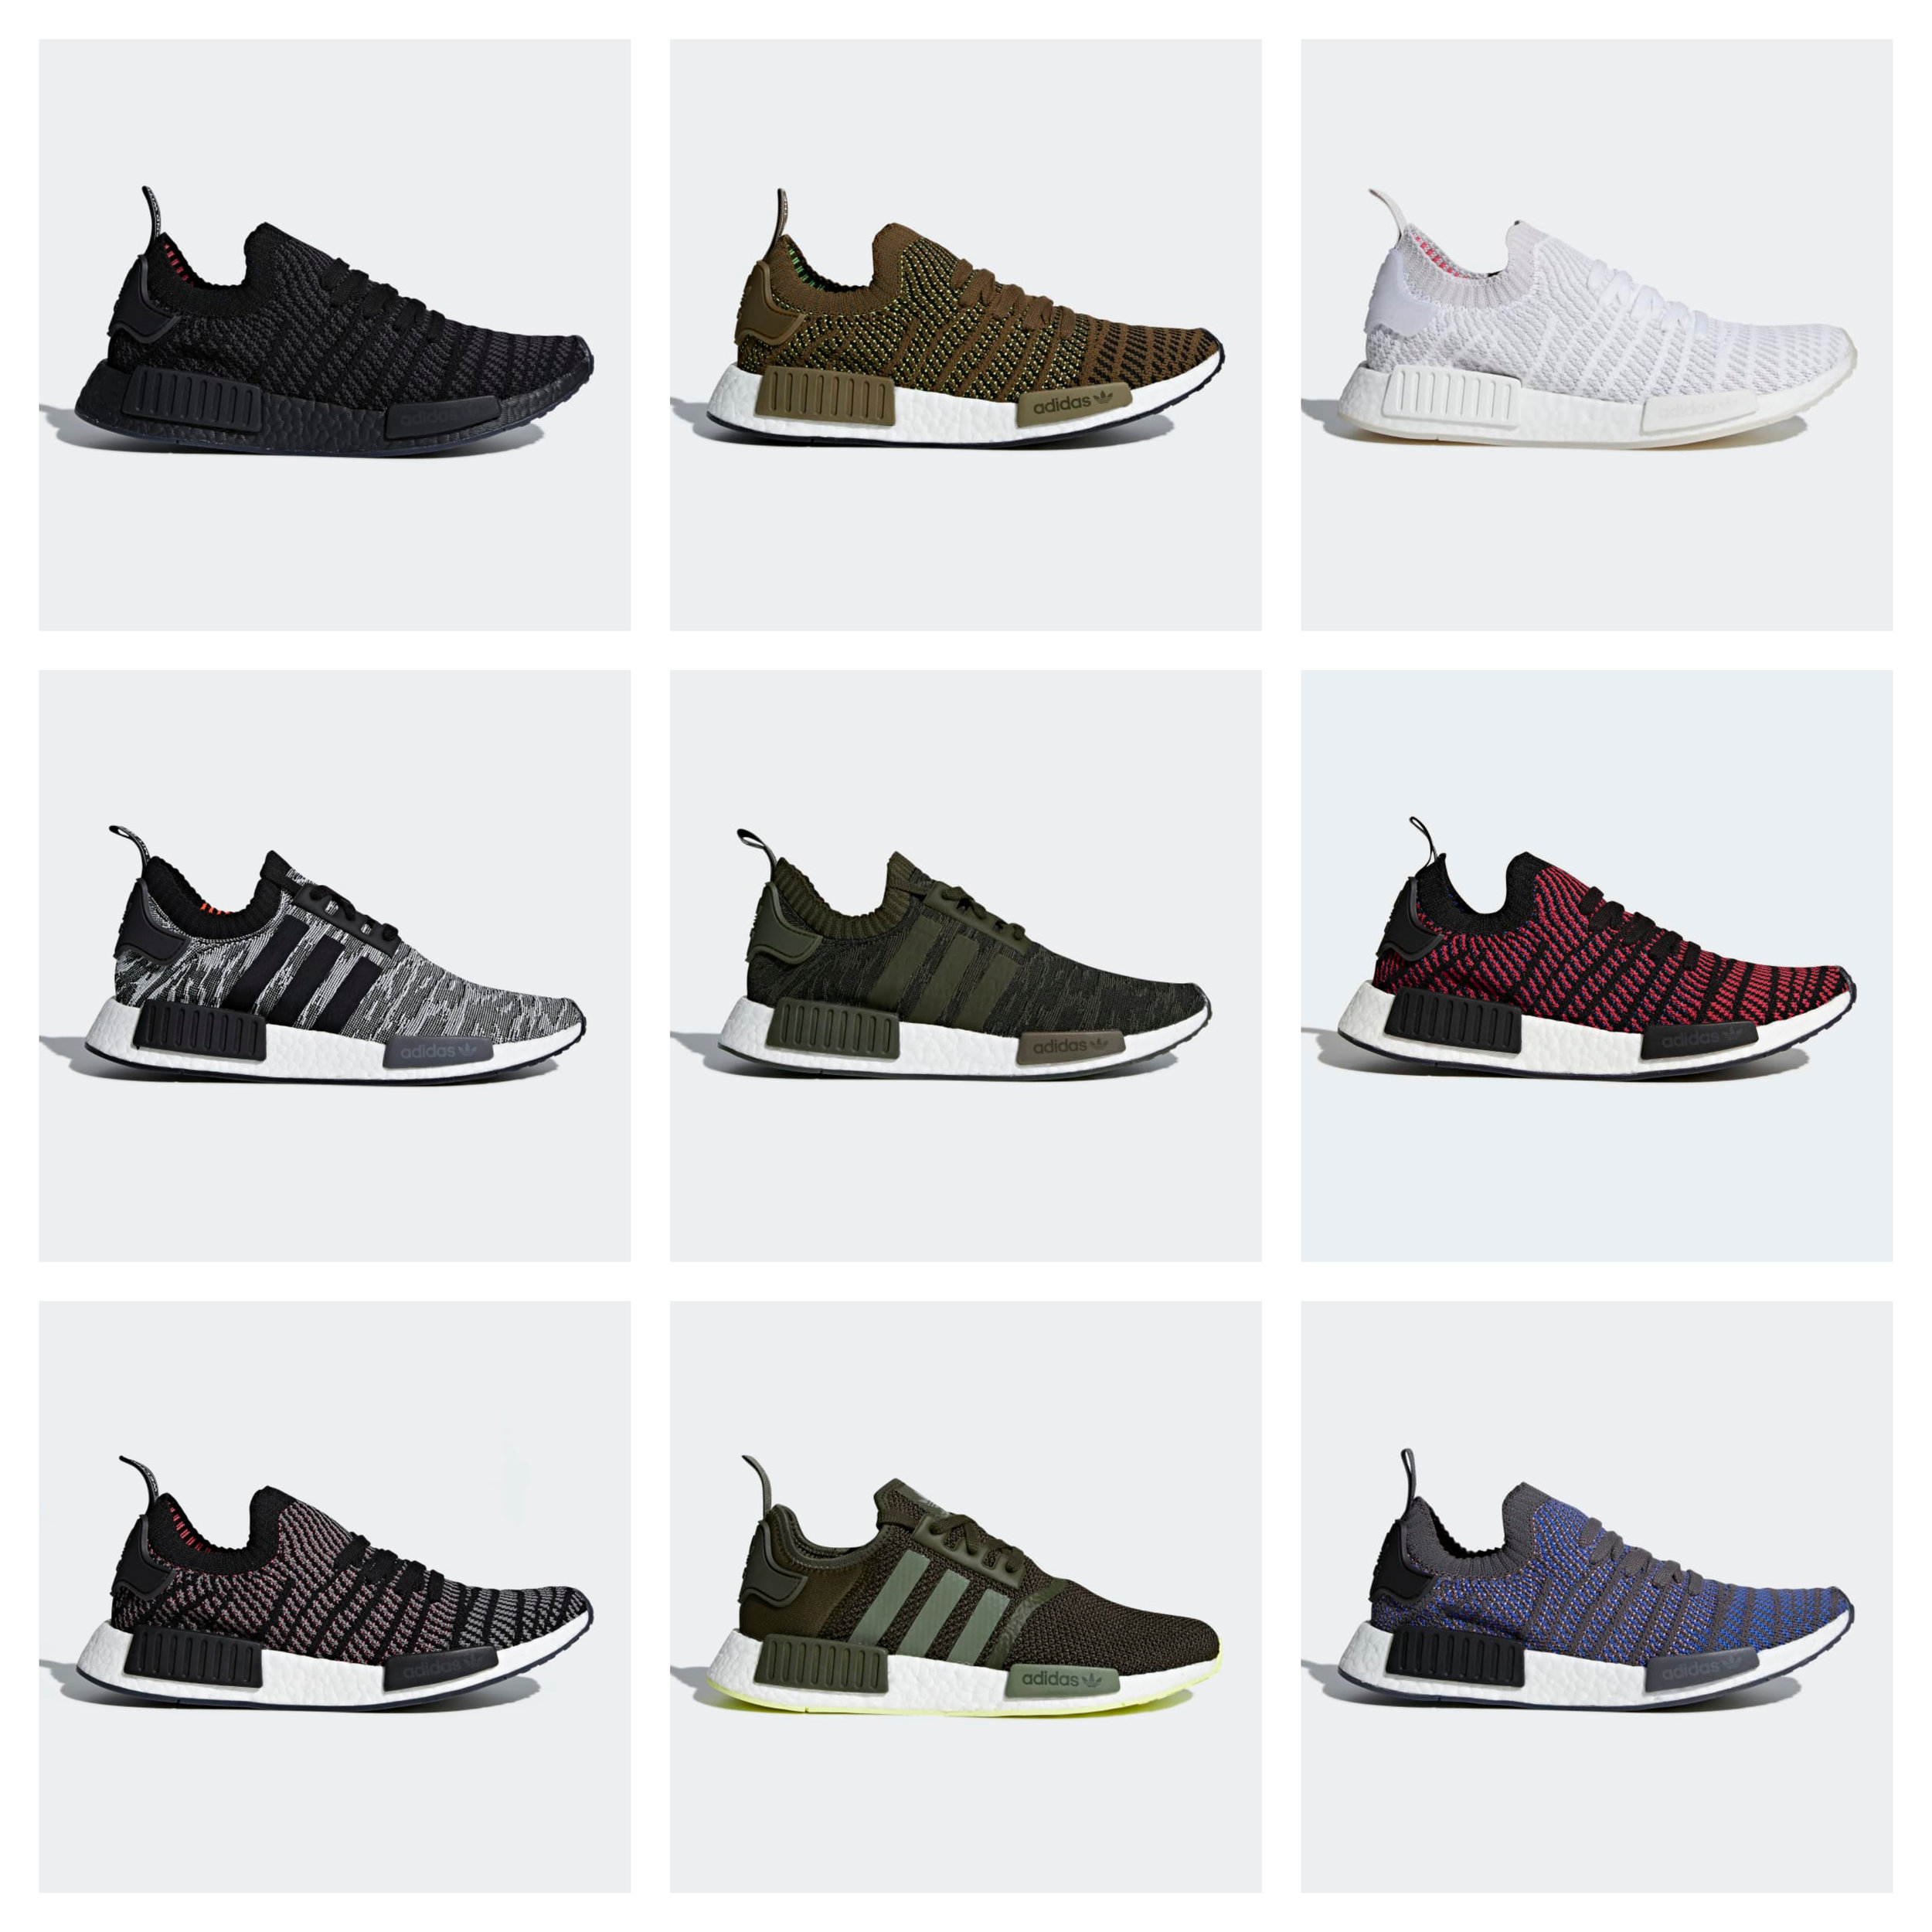 adidas nmd under 50 Shop Clothing